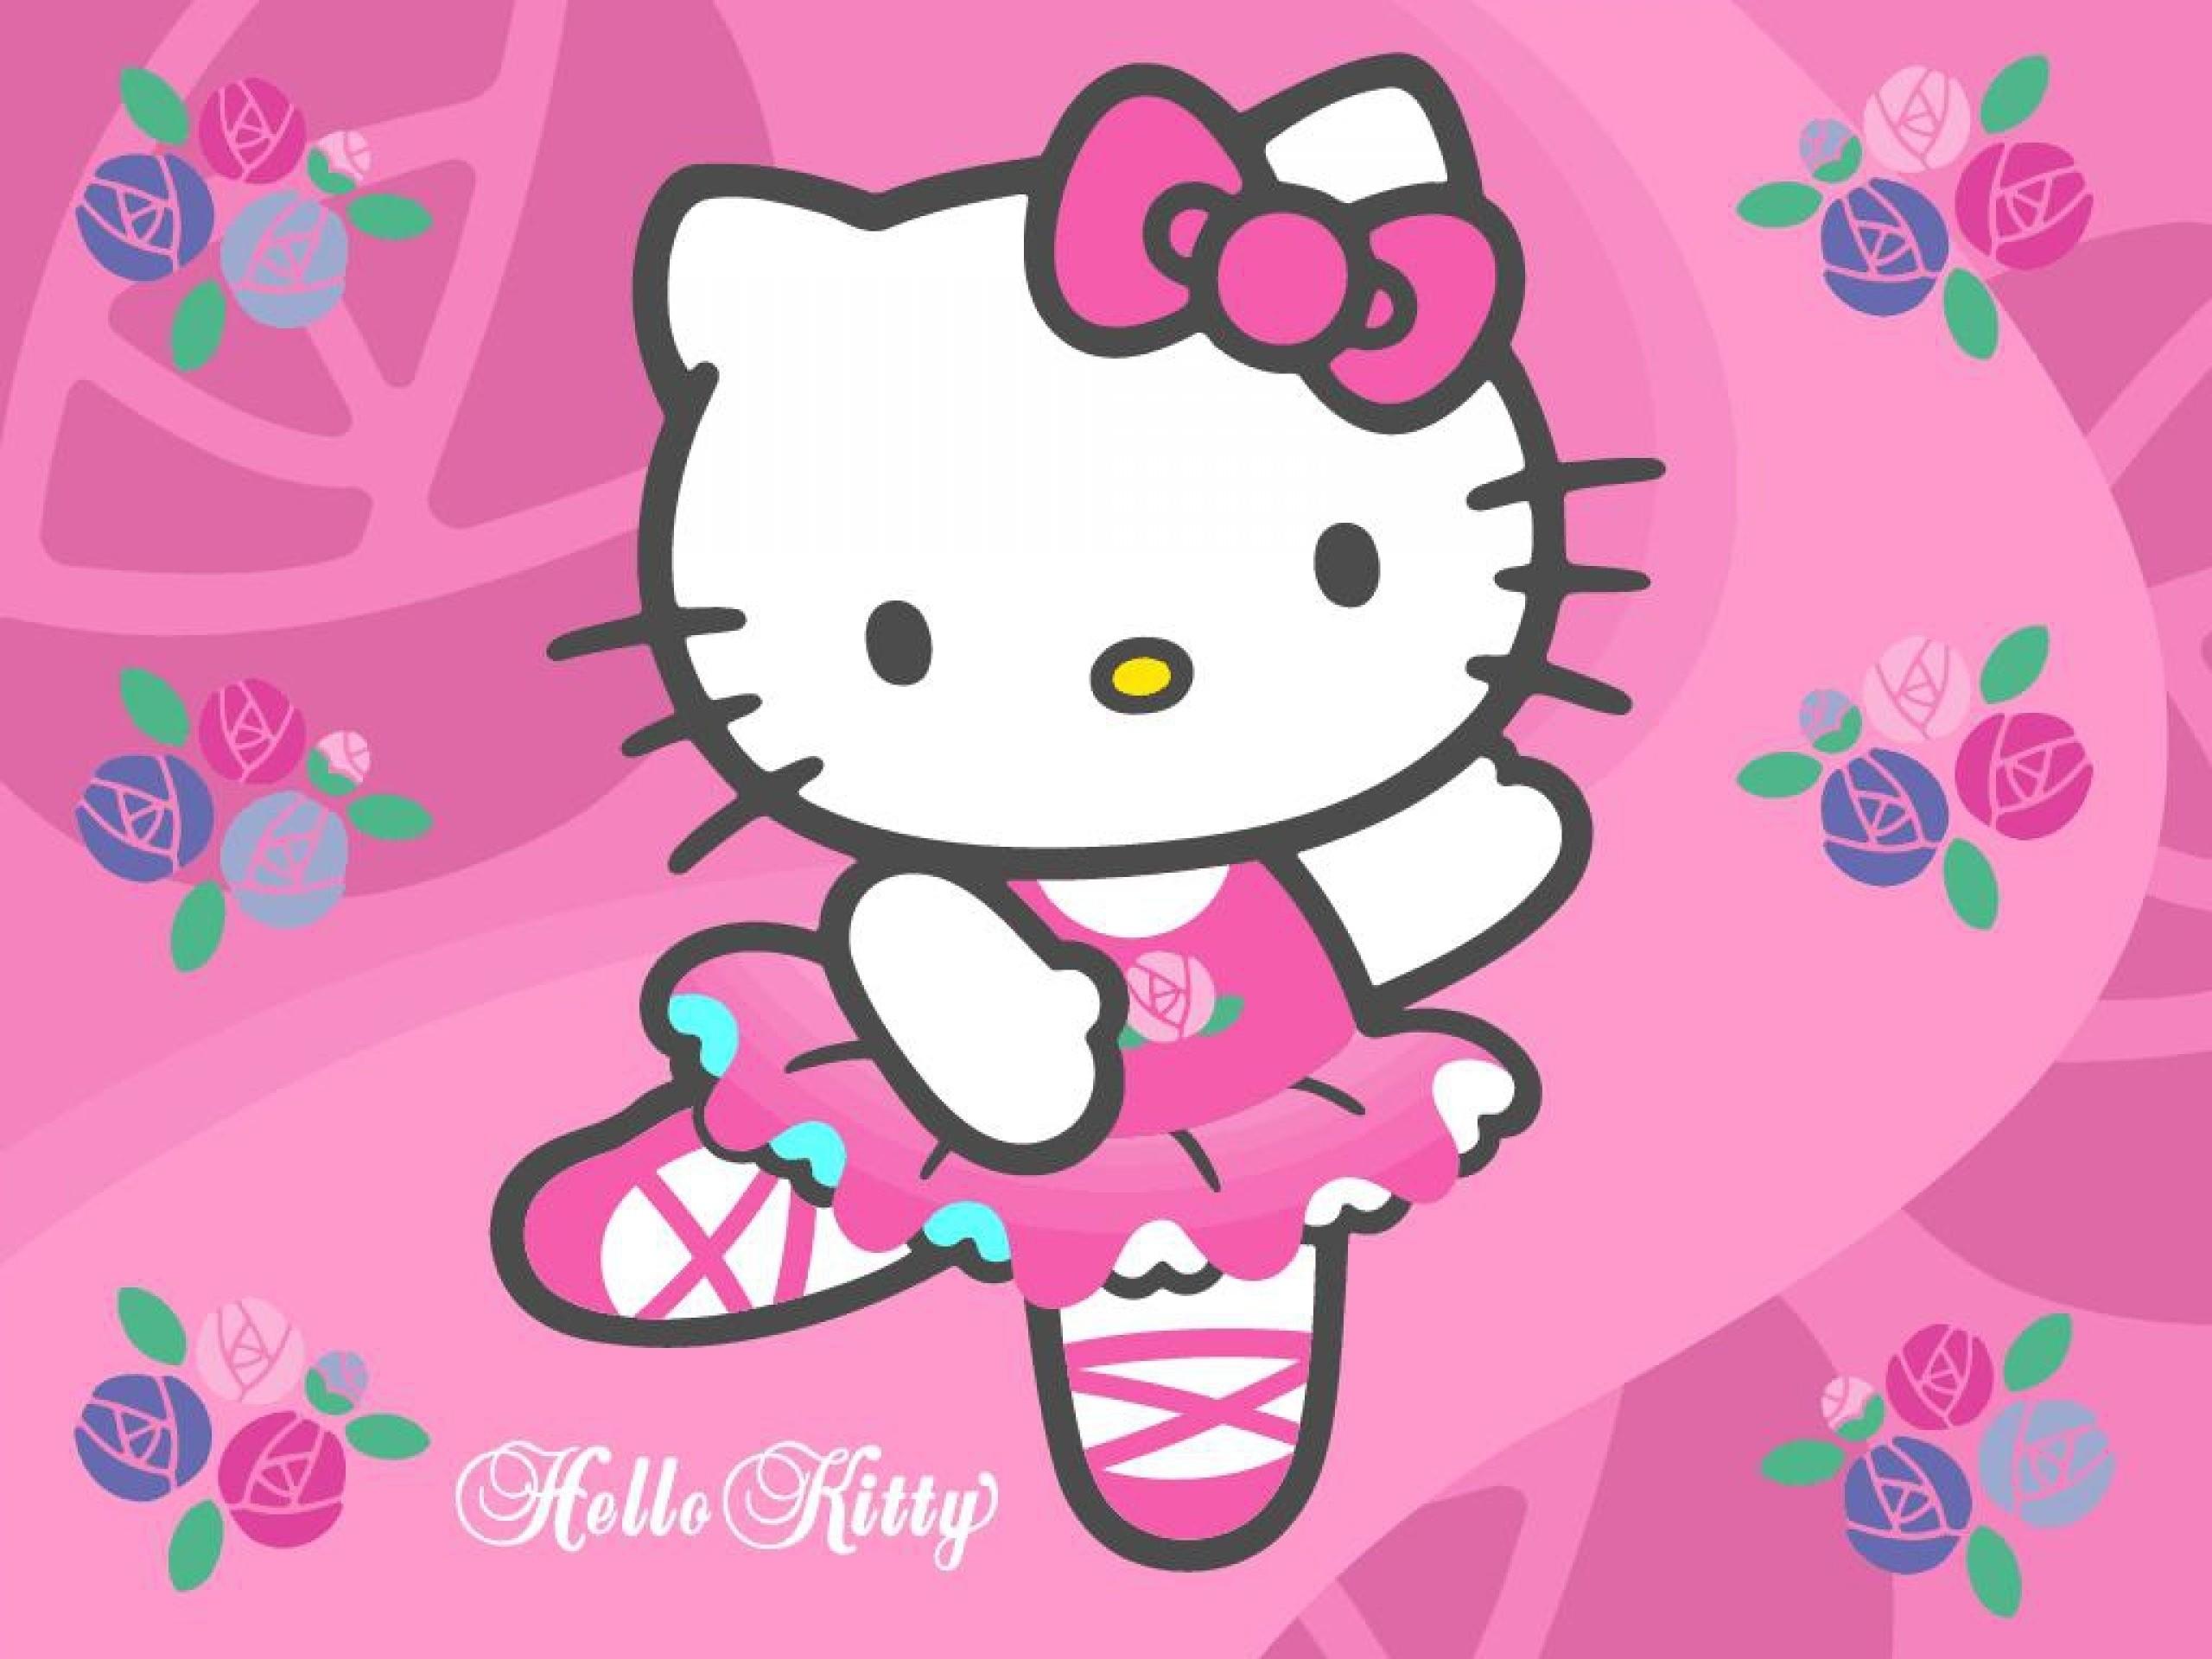 2560x1920 Hello Kitty Zebra Wallpaper Free